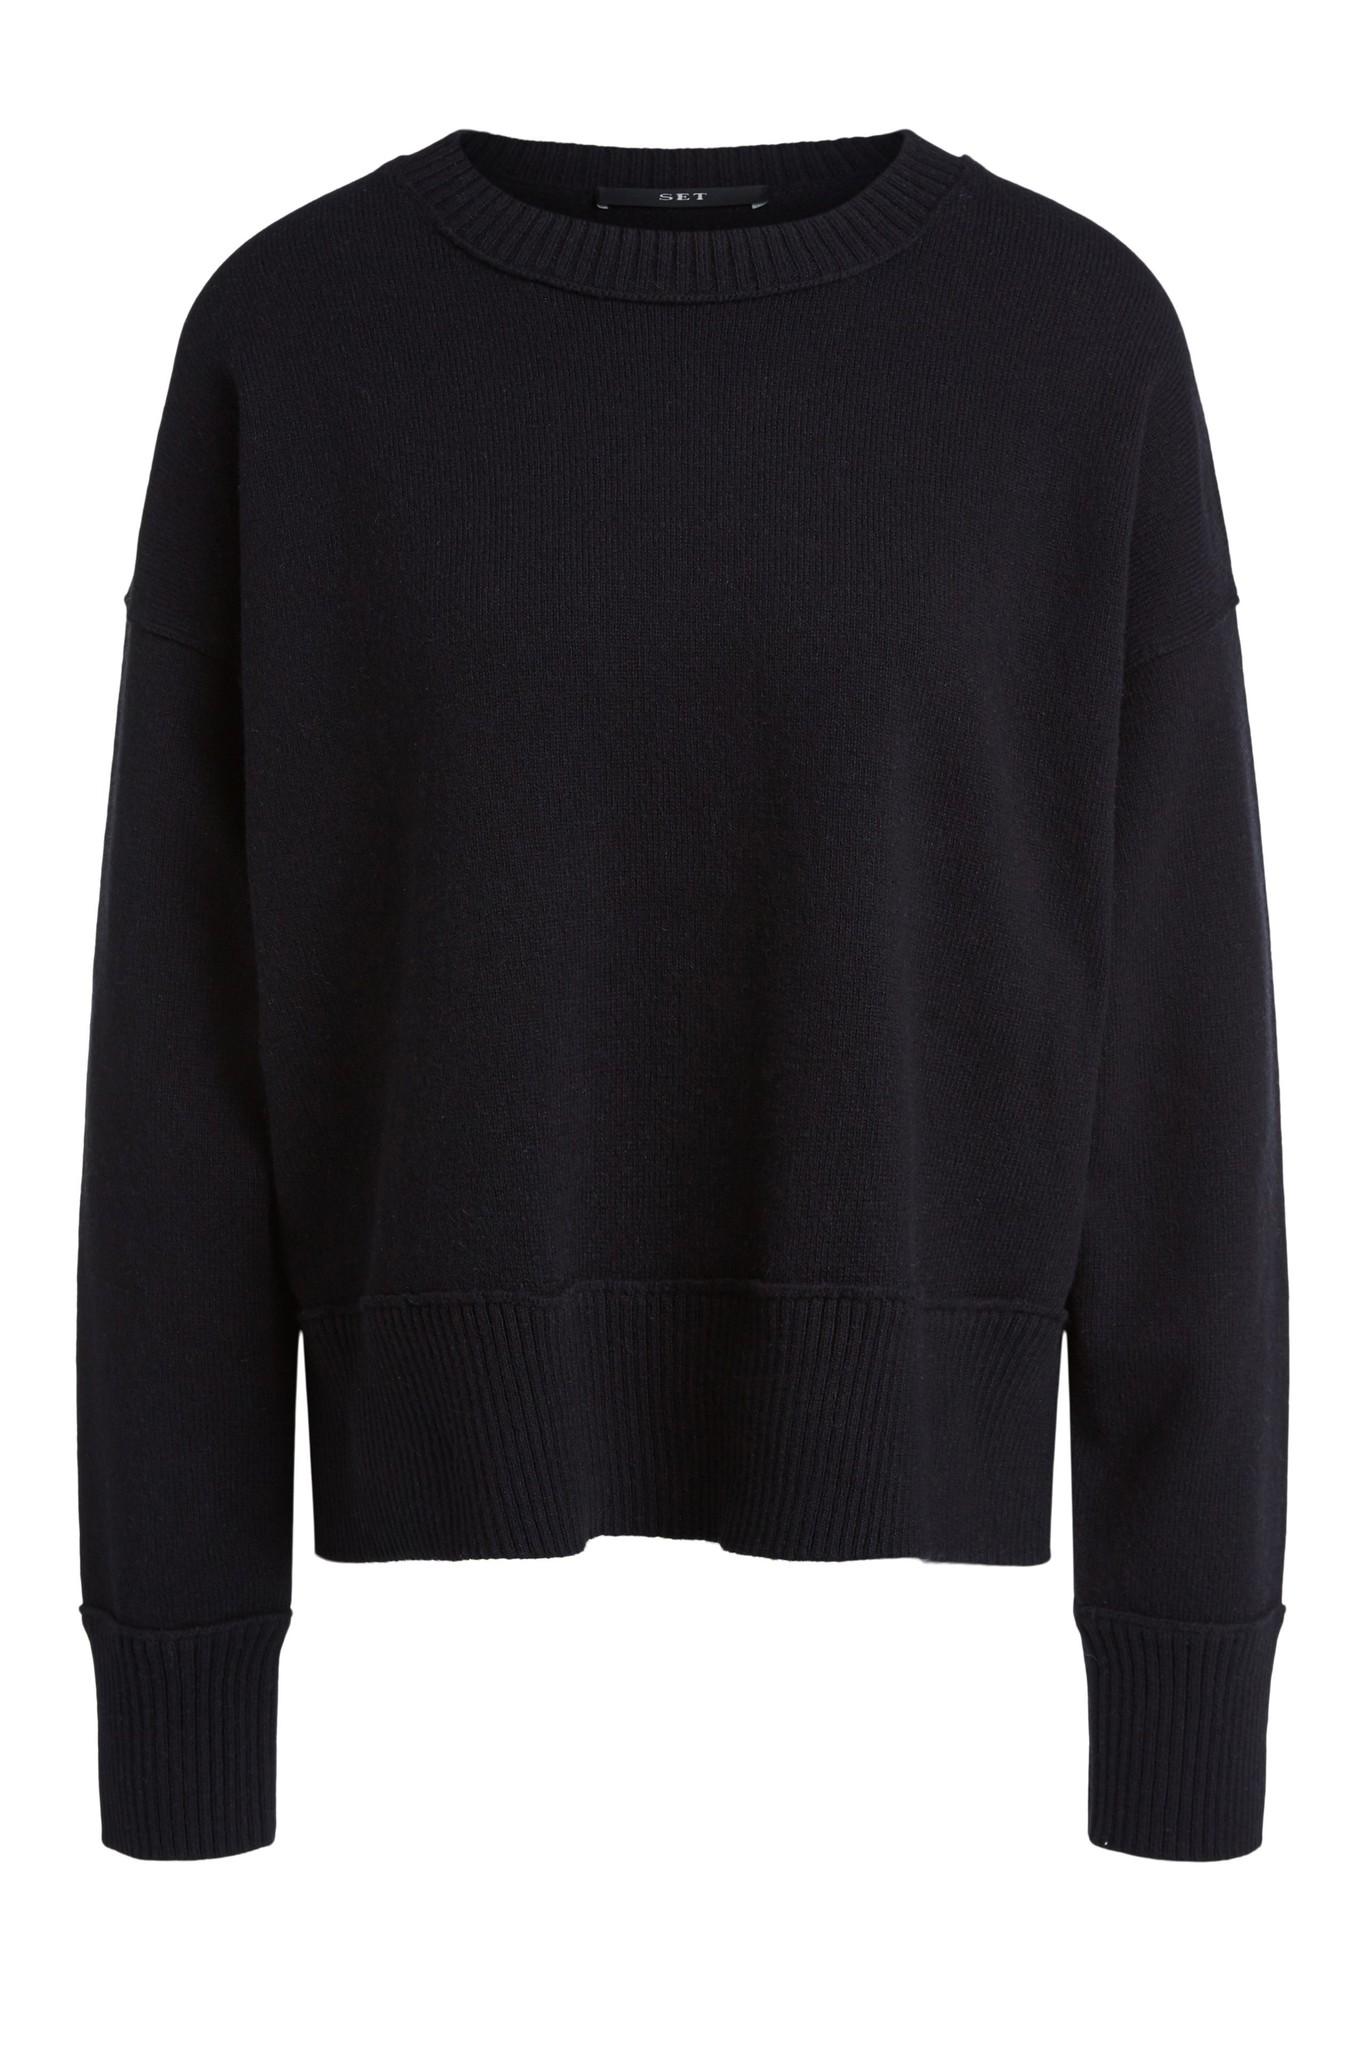 SET pullover 72895 9990-1